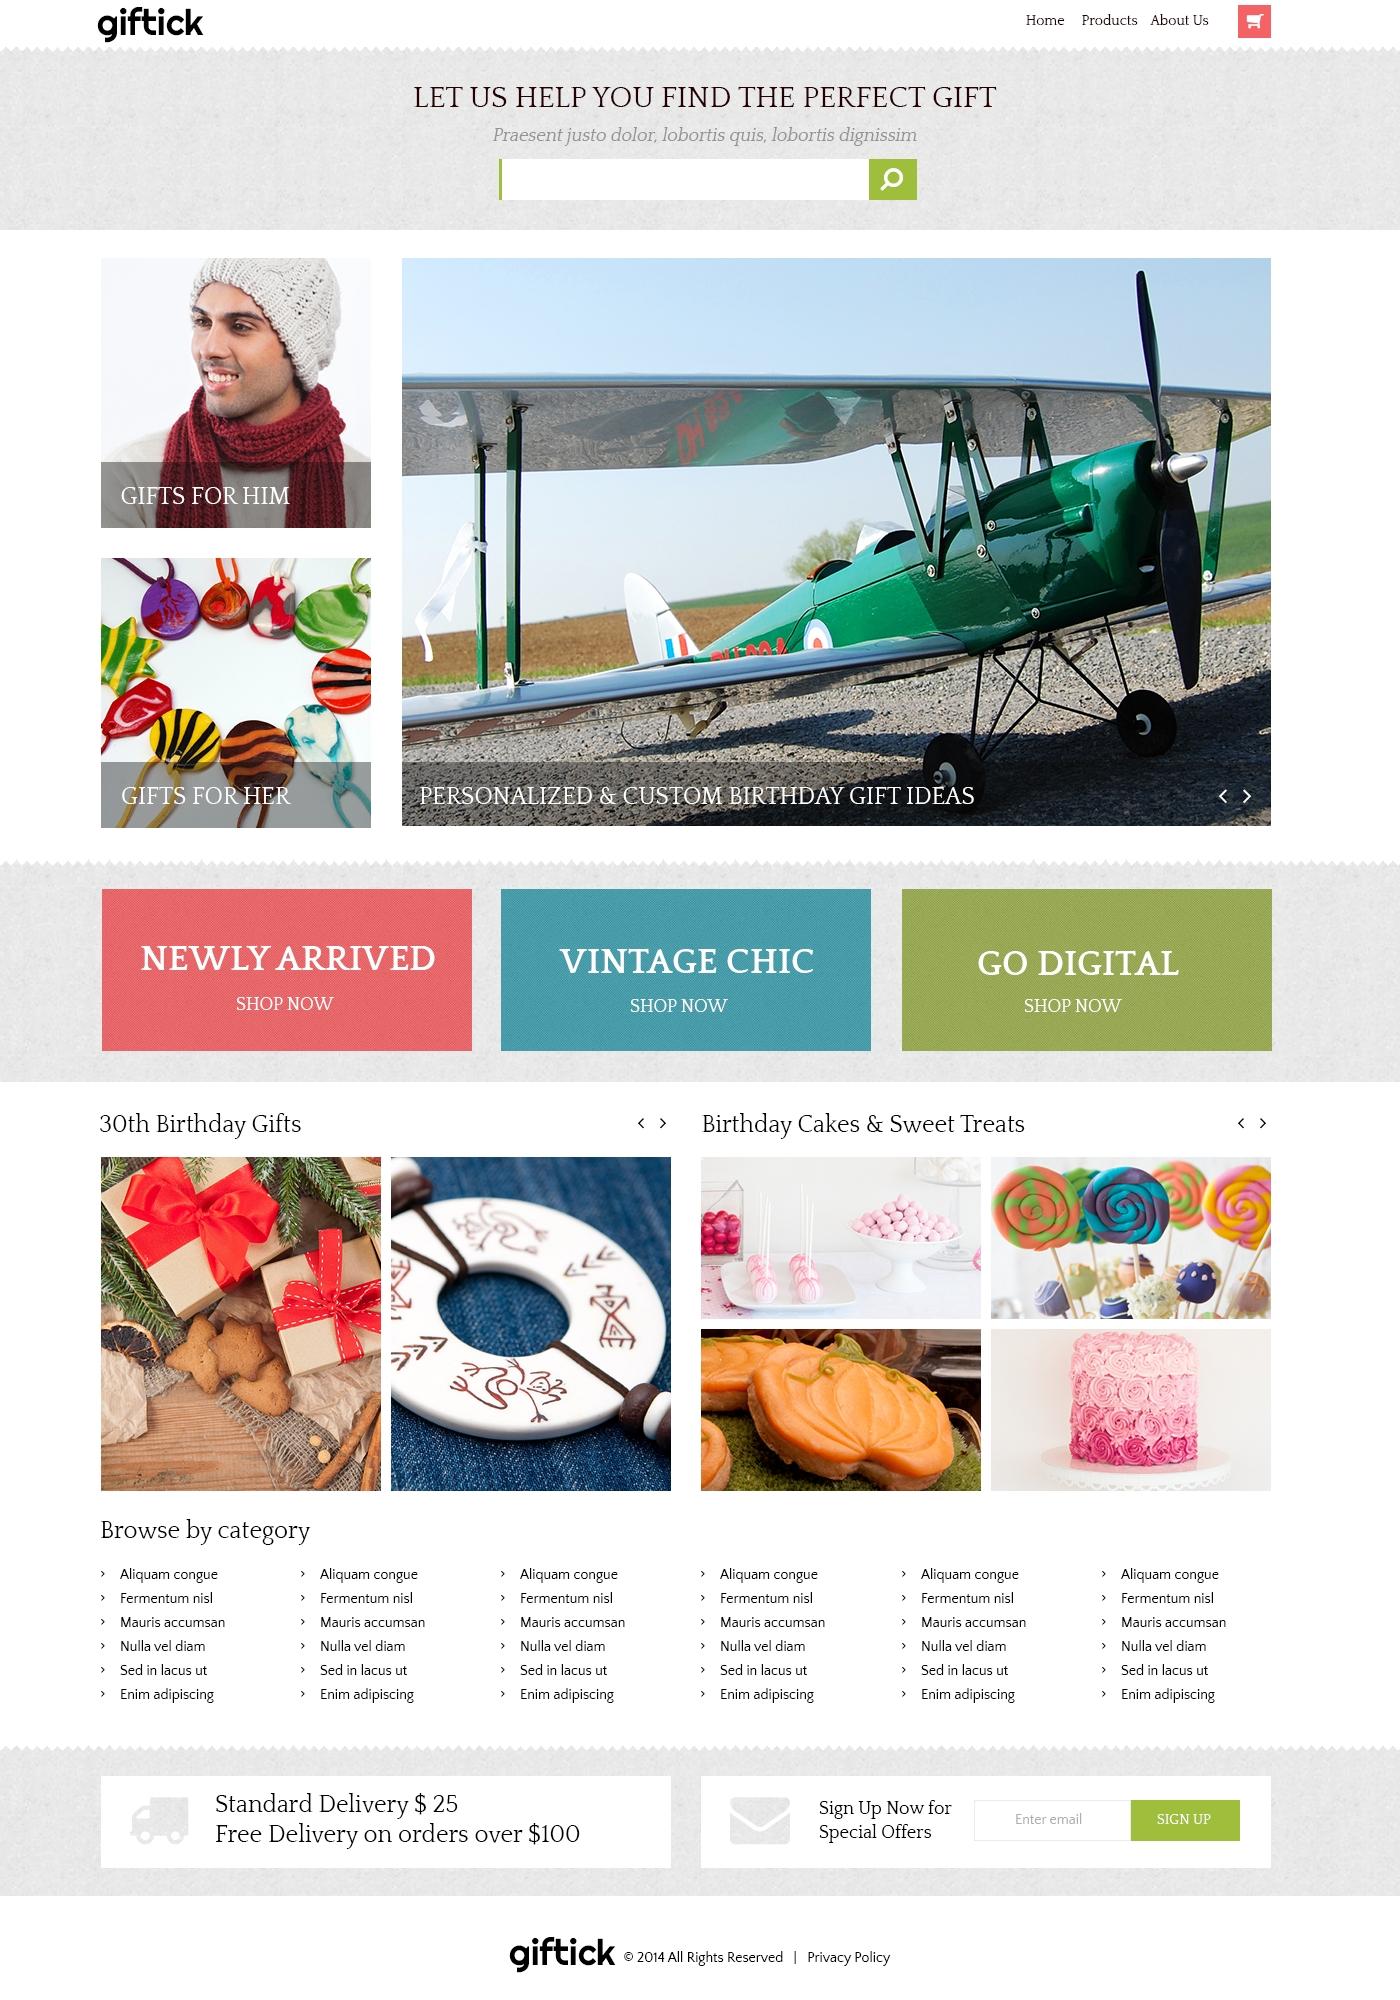 Template Photoshop para Sites de Loja de Presentes №51176